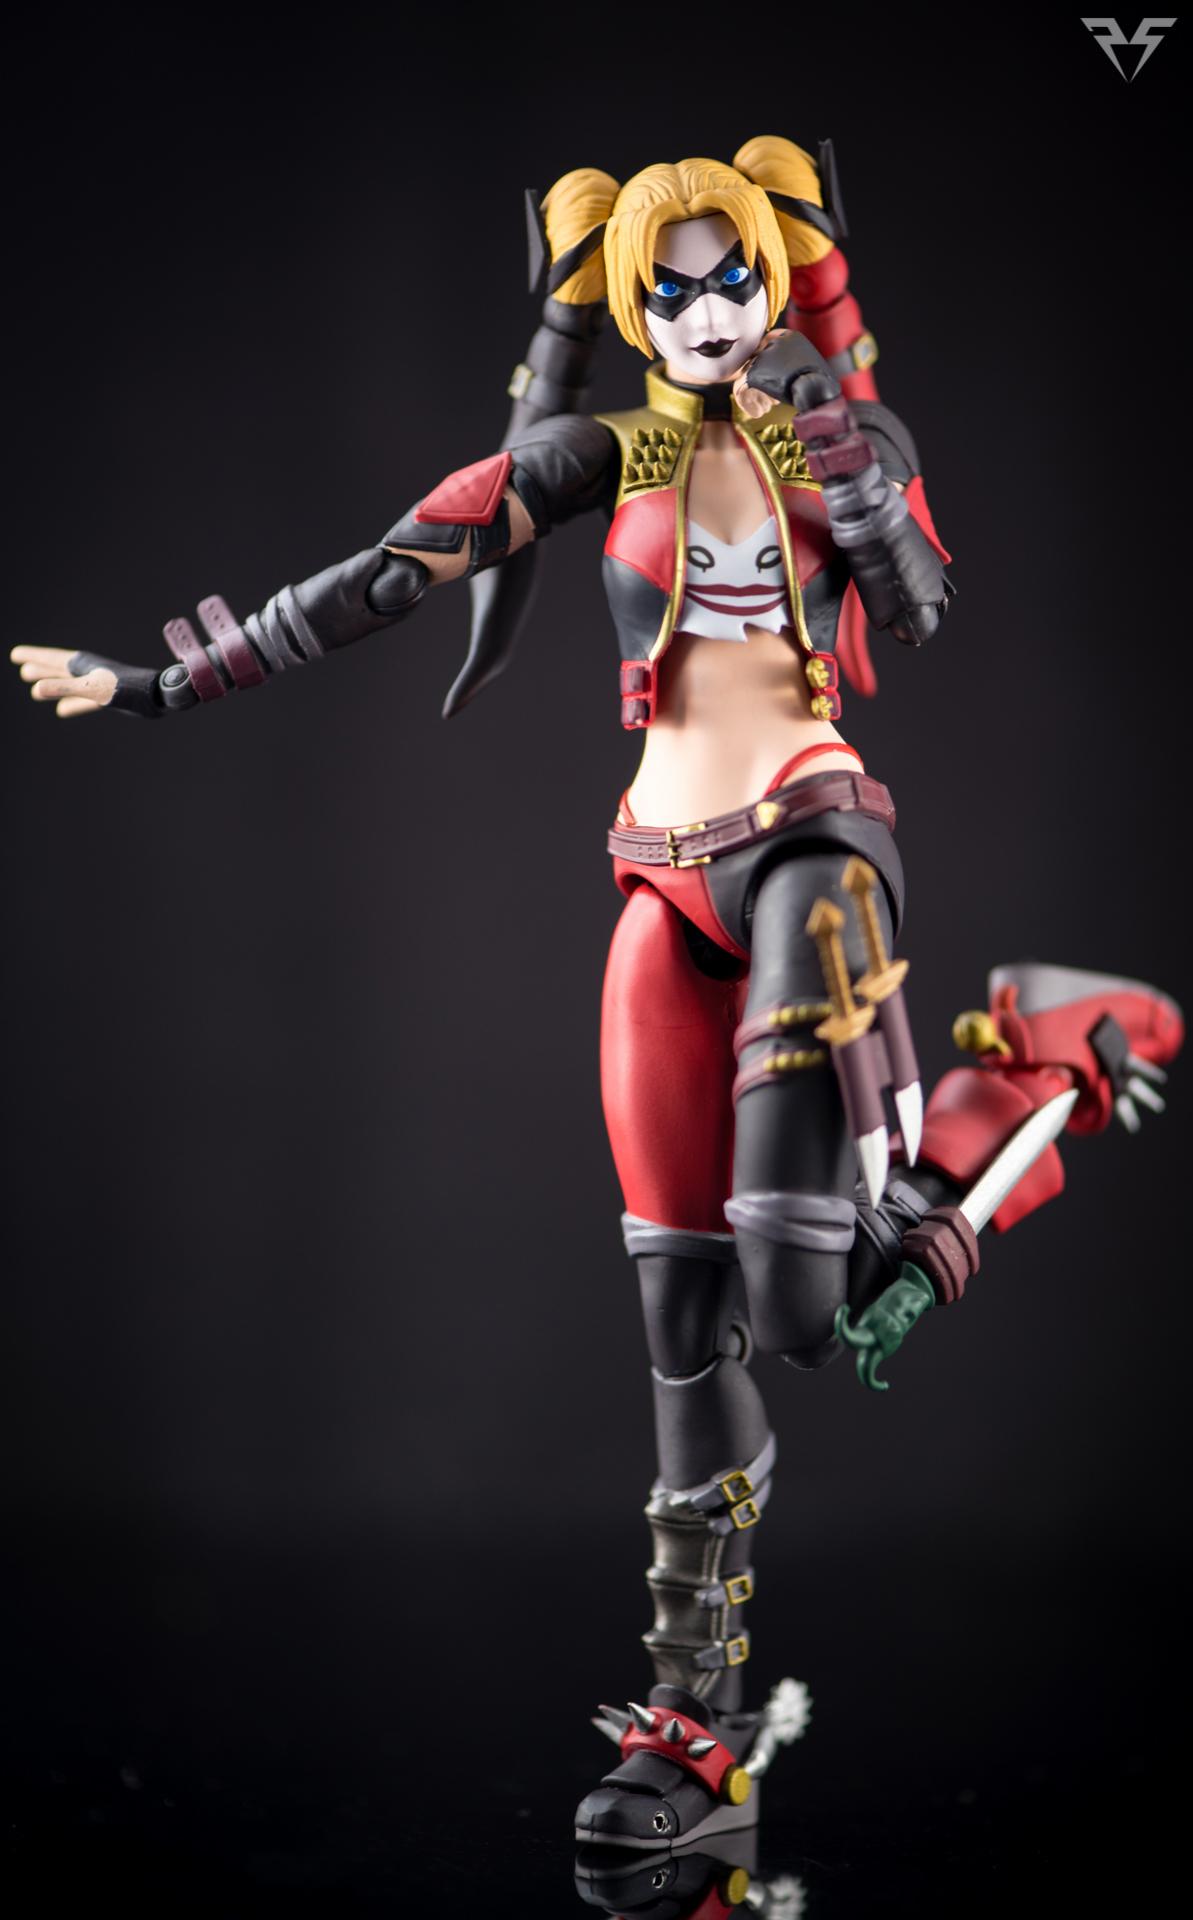 Figuarts Harley Quinn-20.jpg